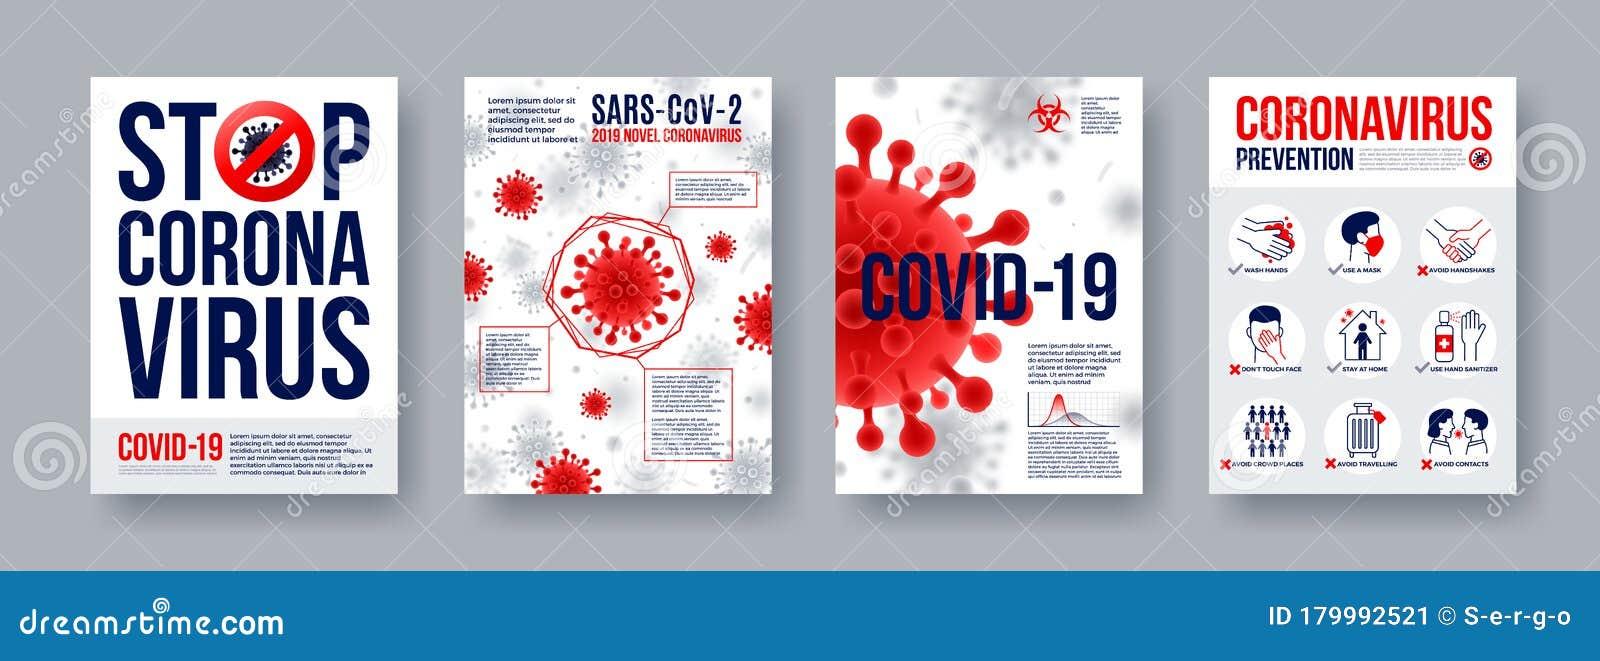 Coronavirus Poster Set With Infographics Elements Novel Coronavirus 2019 Ncov Banners Concept Of Dangerous Covid 19 Pandemic Stock Vector Illustration Of Outbreak Concept 179992521